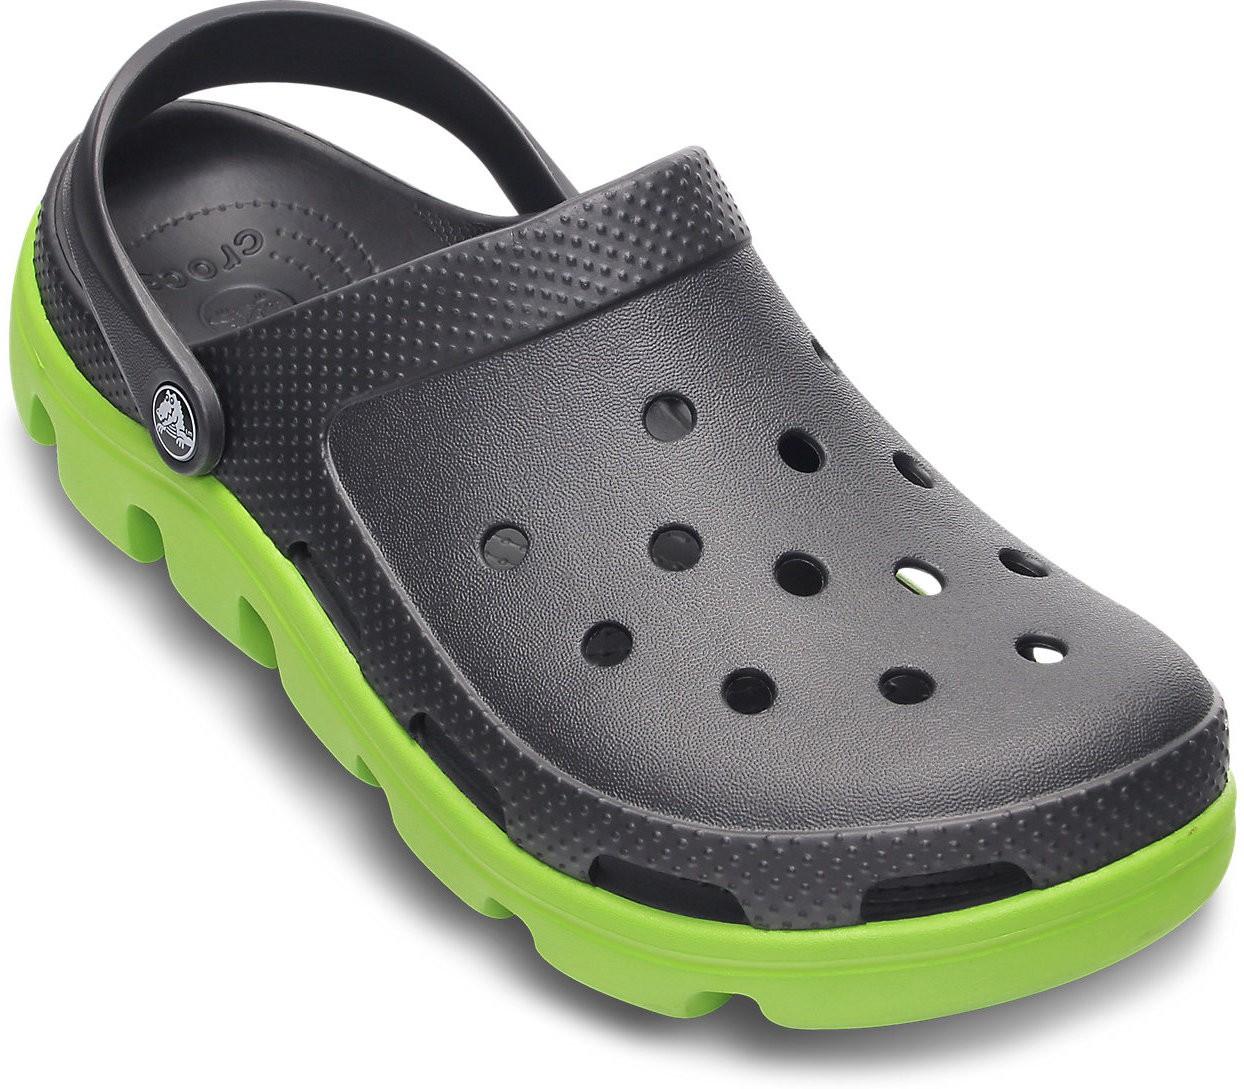 a668f013c Crocs Men Sandals in Hypercity Retail India